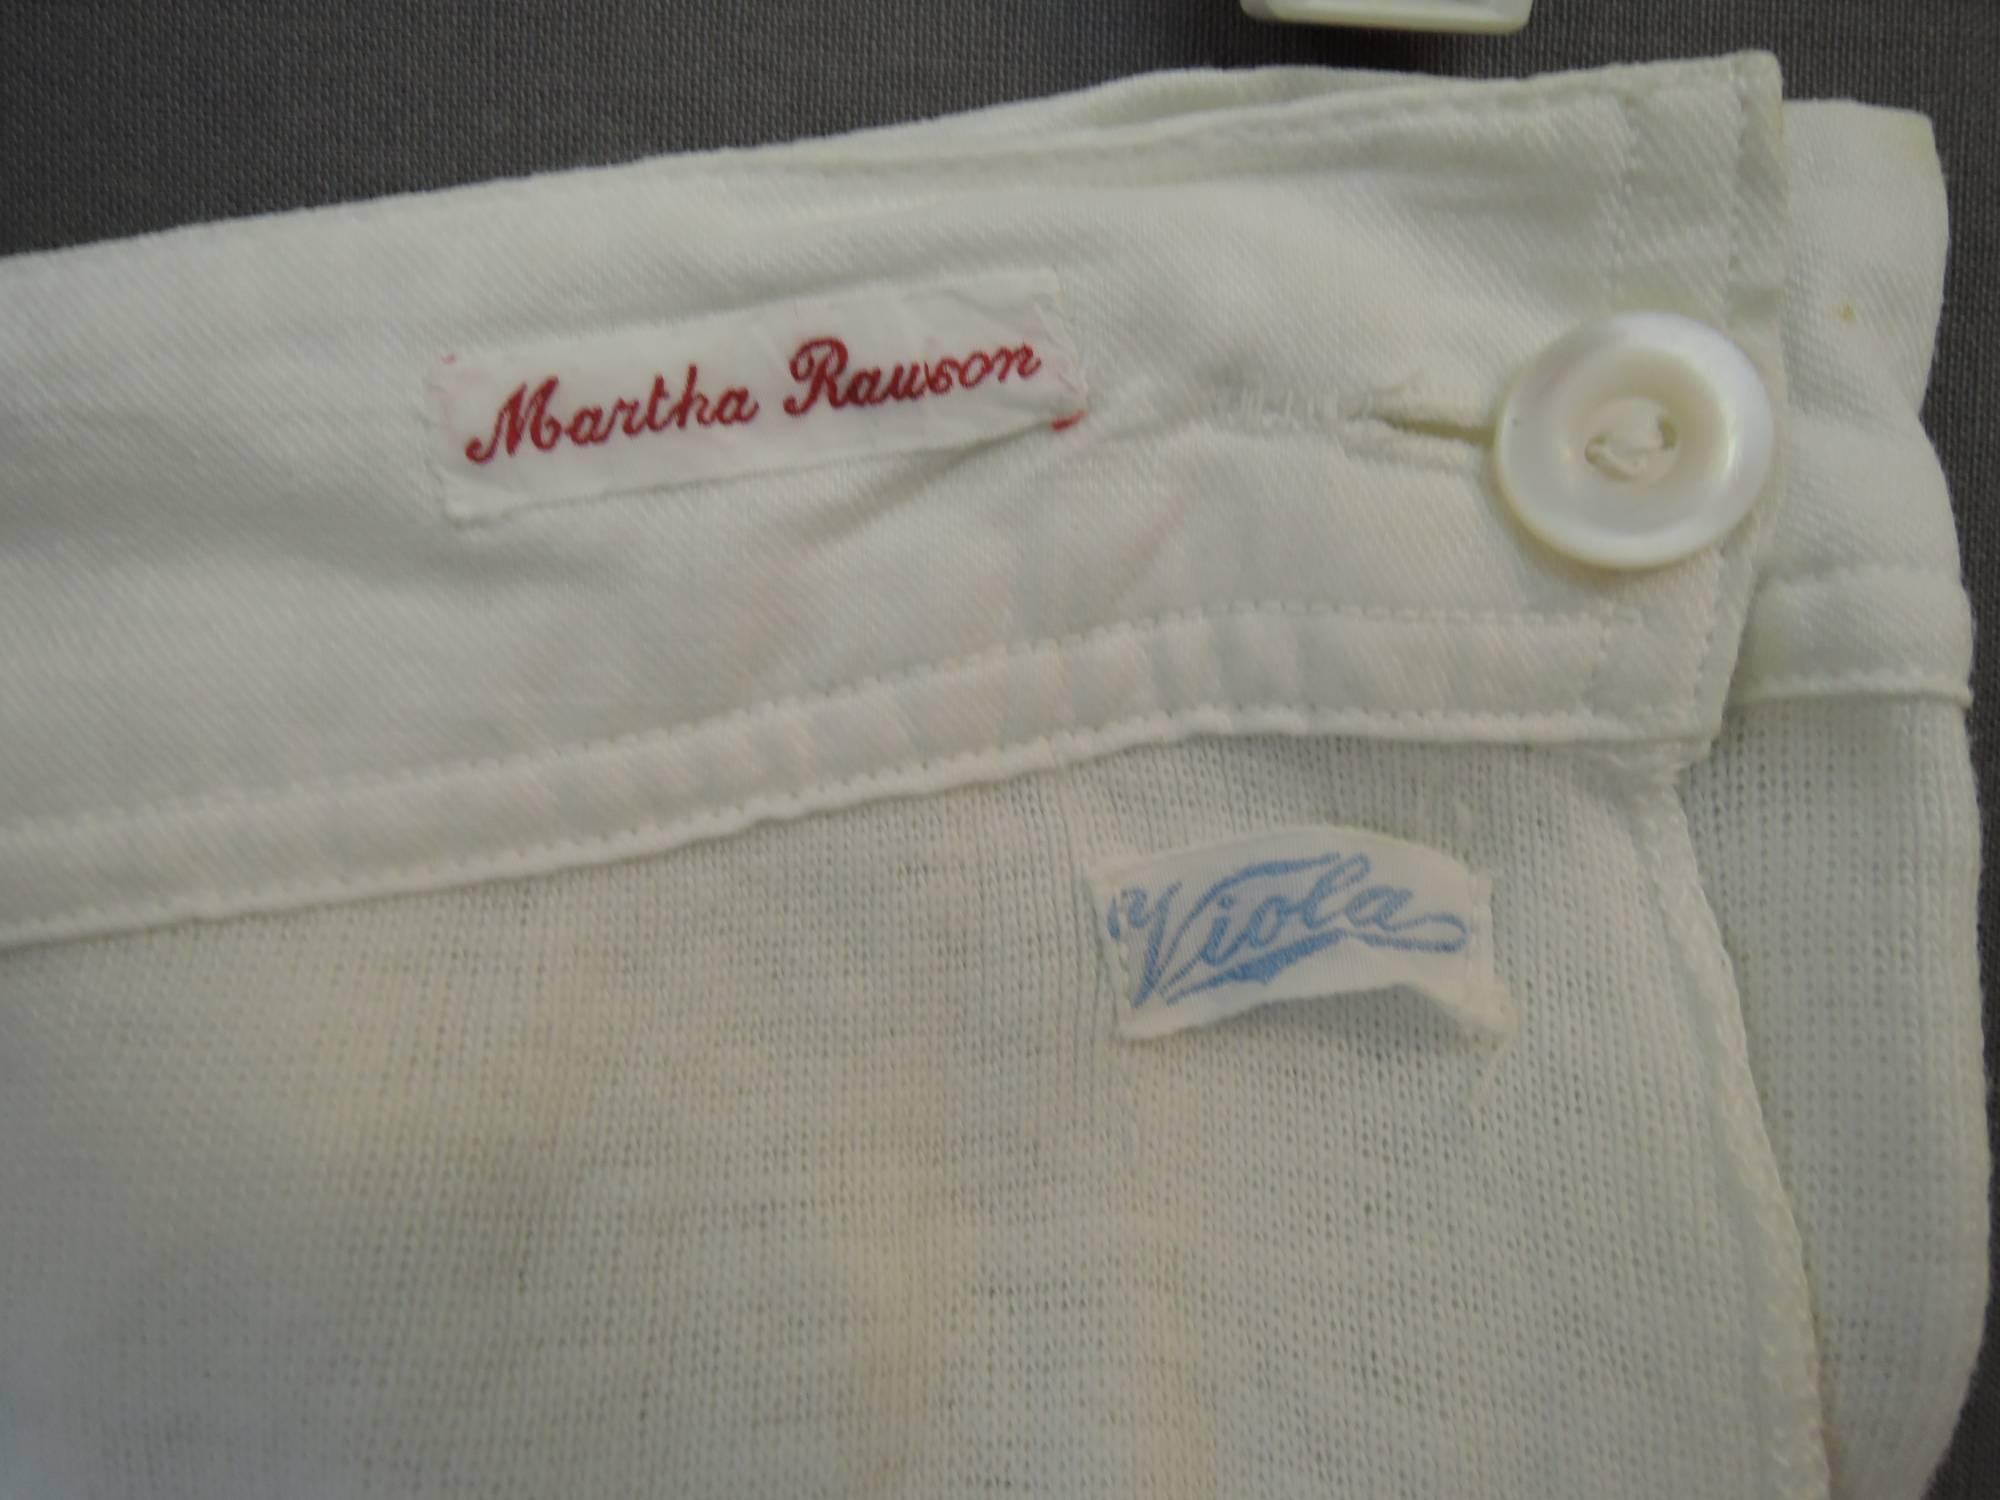 Vintage Women's Long Johns, Knit Cotton Underwear with Split Crotch, 30 inch waist, 1930s